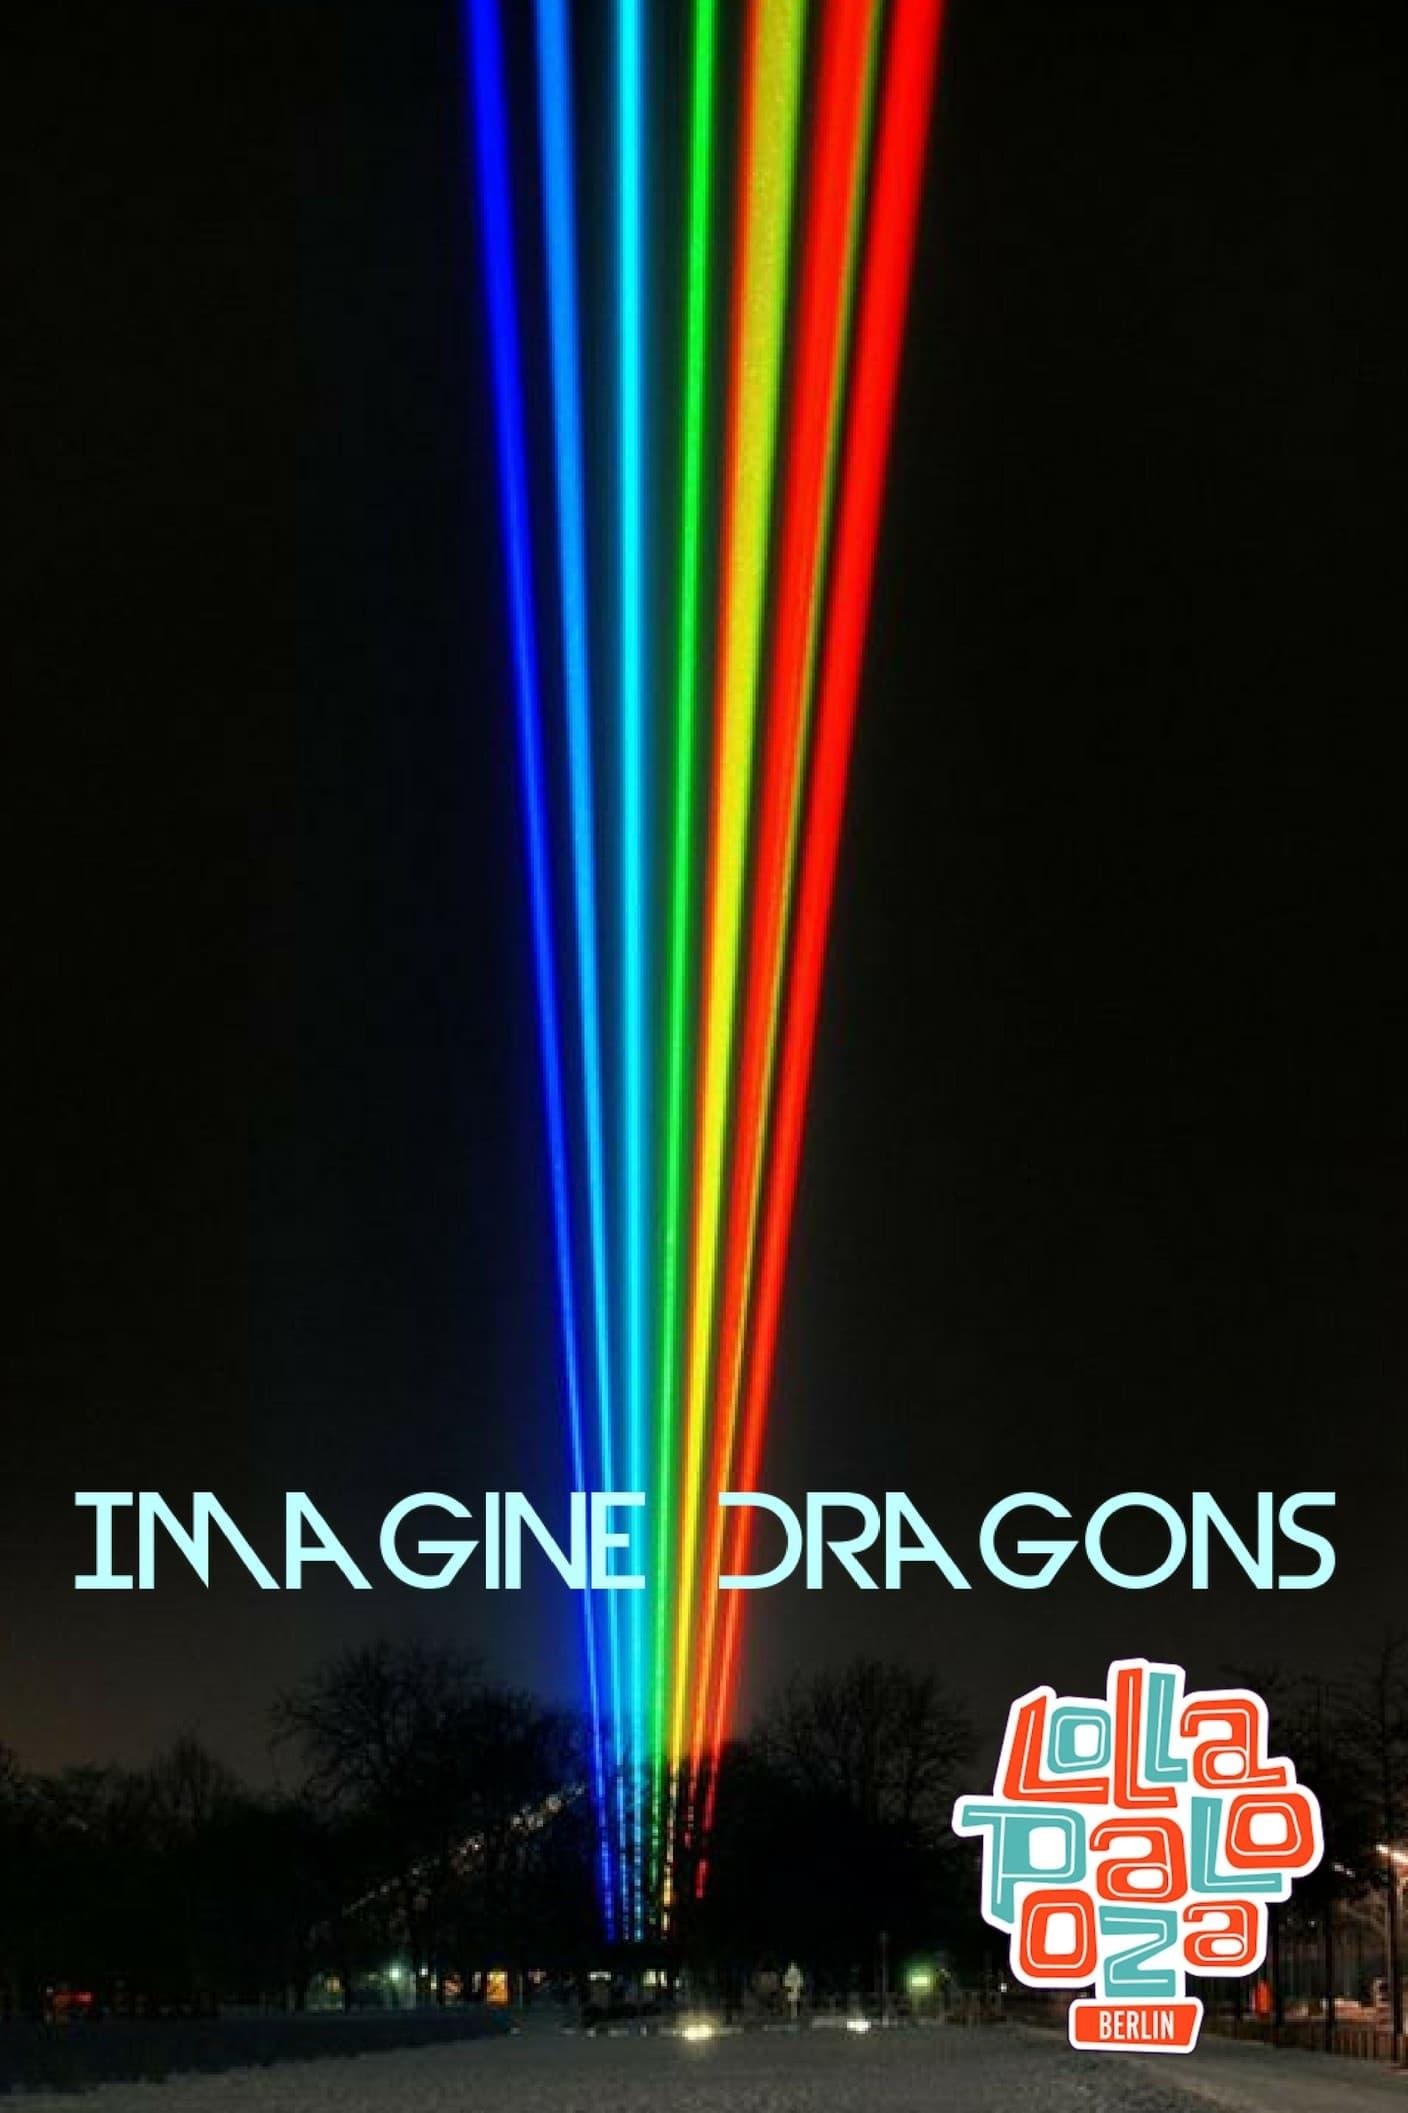 Imagine Dragons Live at Lollapalooza Berlin 2018 (2018)